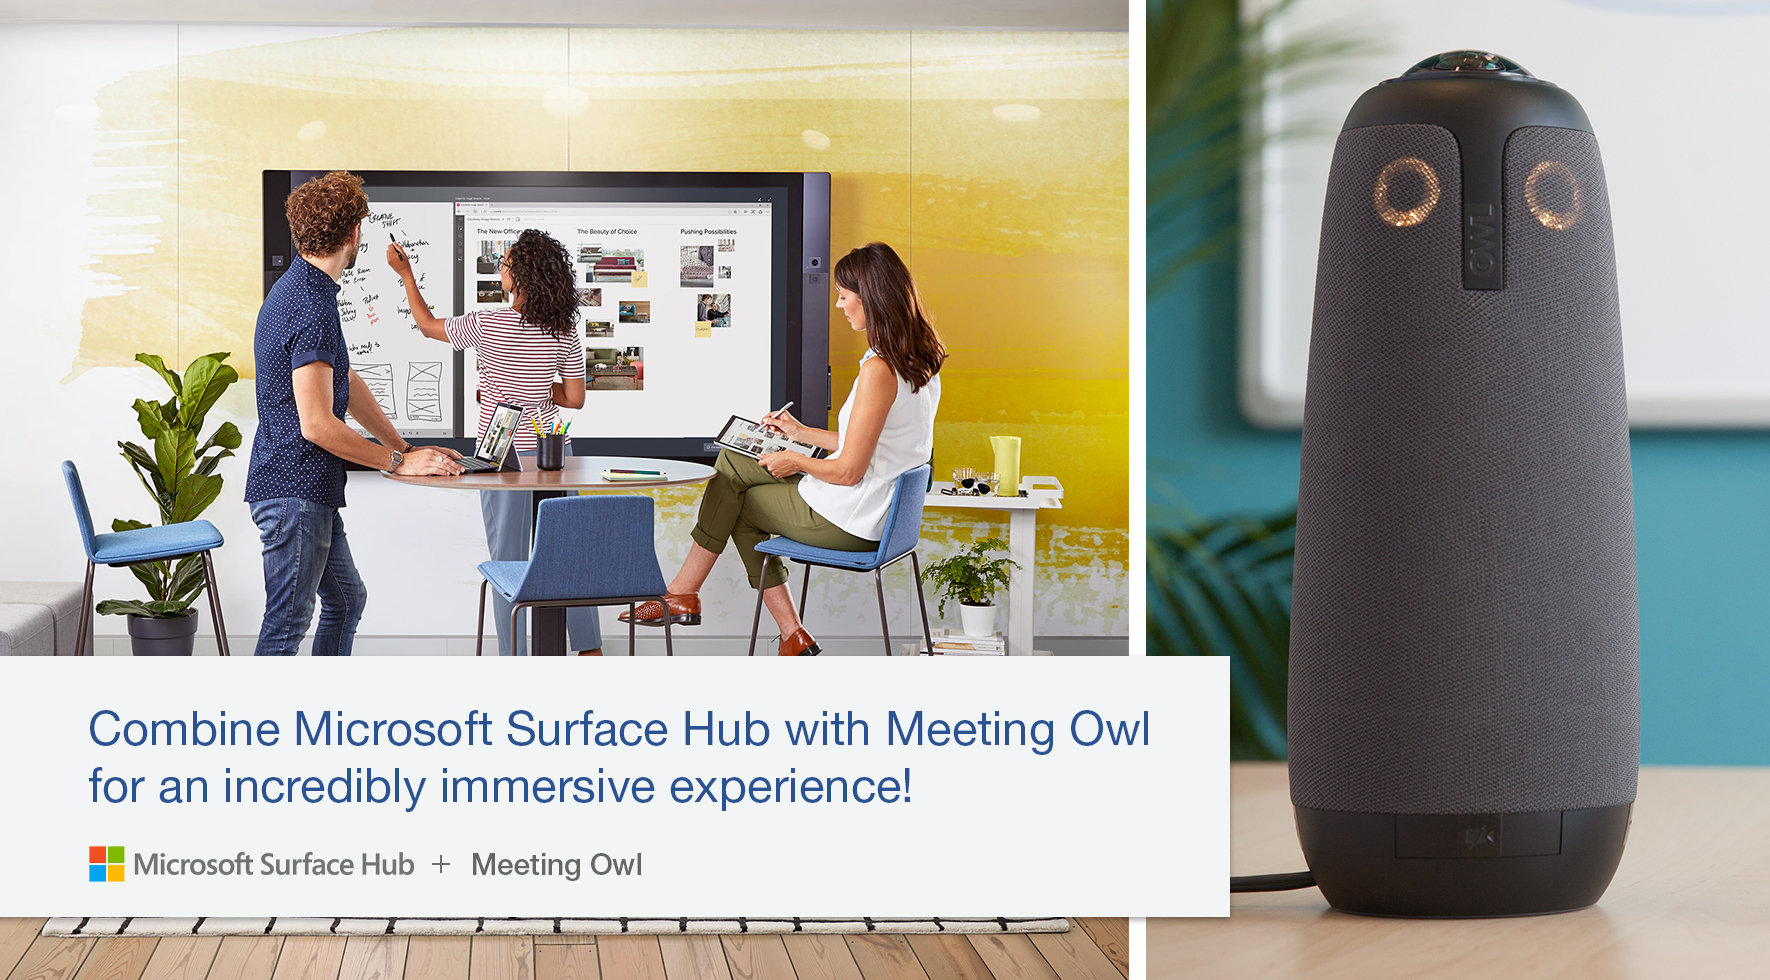 Microsoft Surface Hub plus Meeting Owl creates an immersive experience